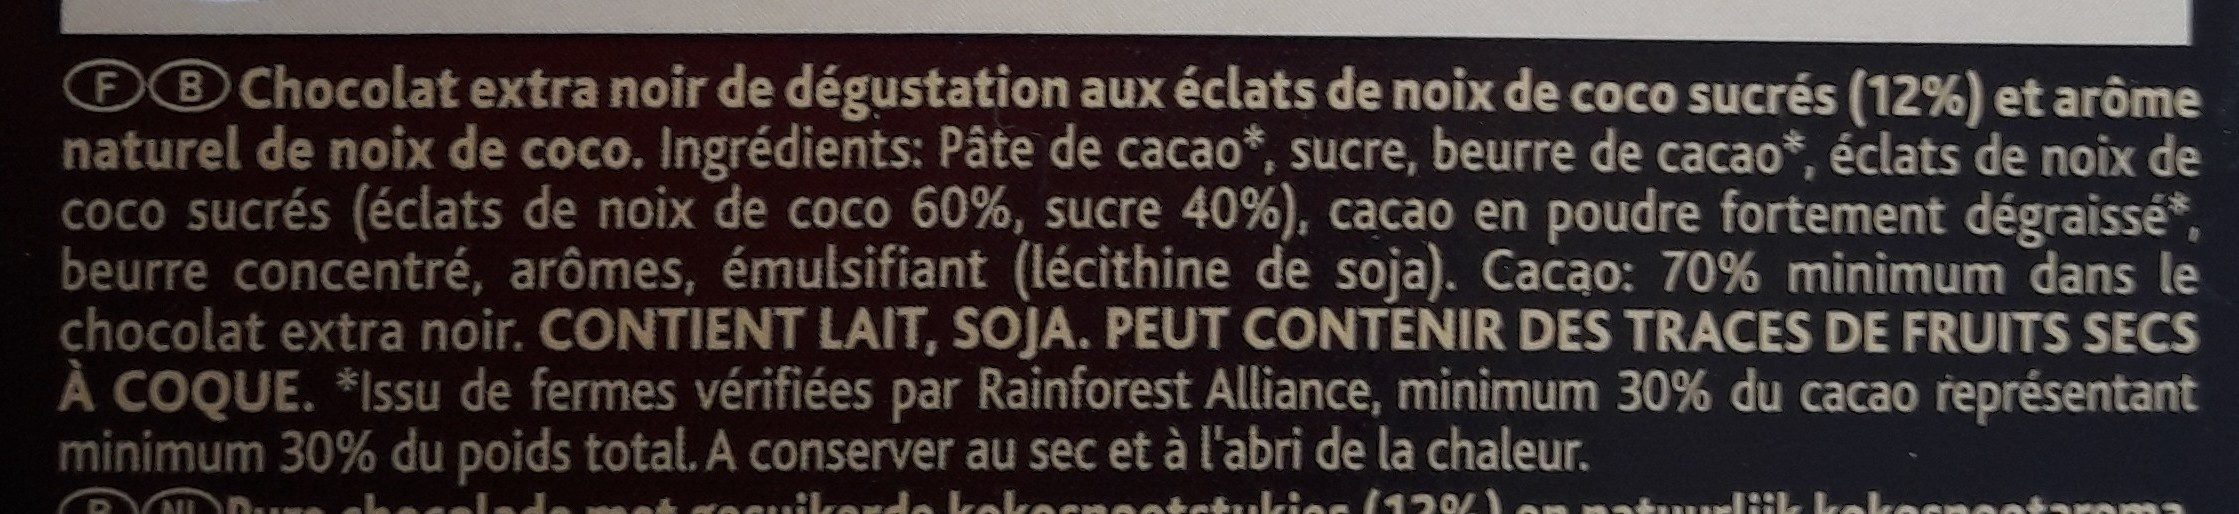 CHOCOLAT - Noix de coco - Noir 70% - Ingrediënten